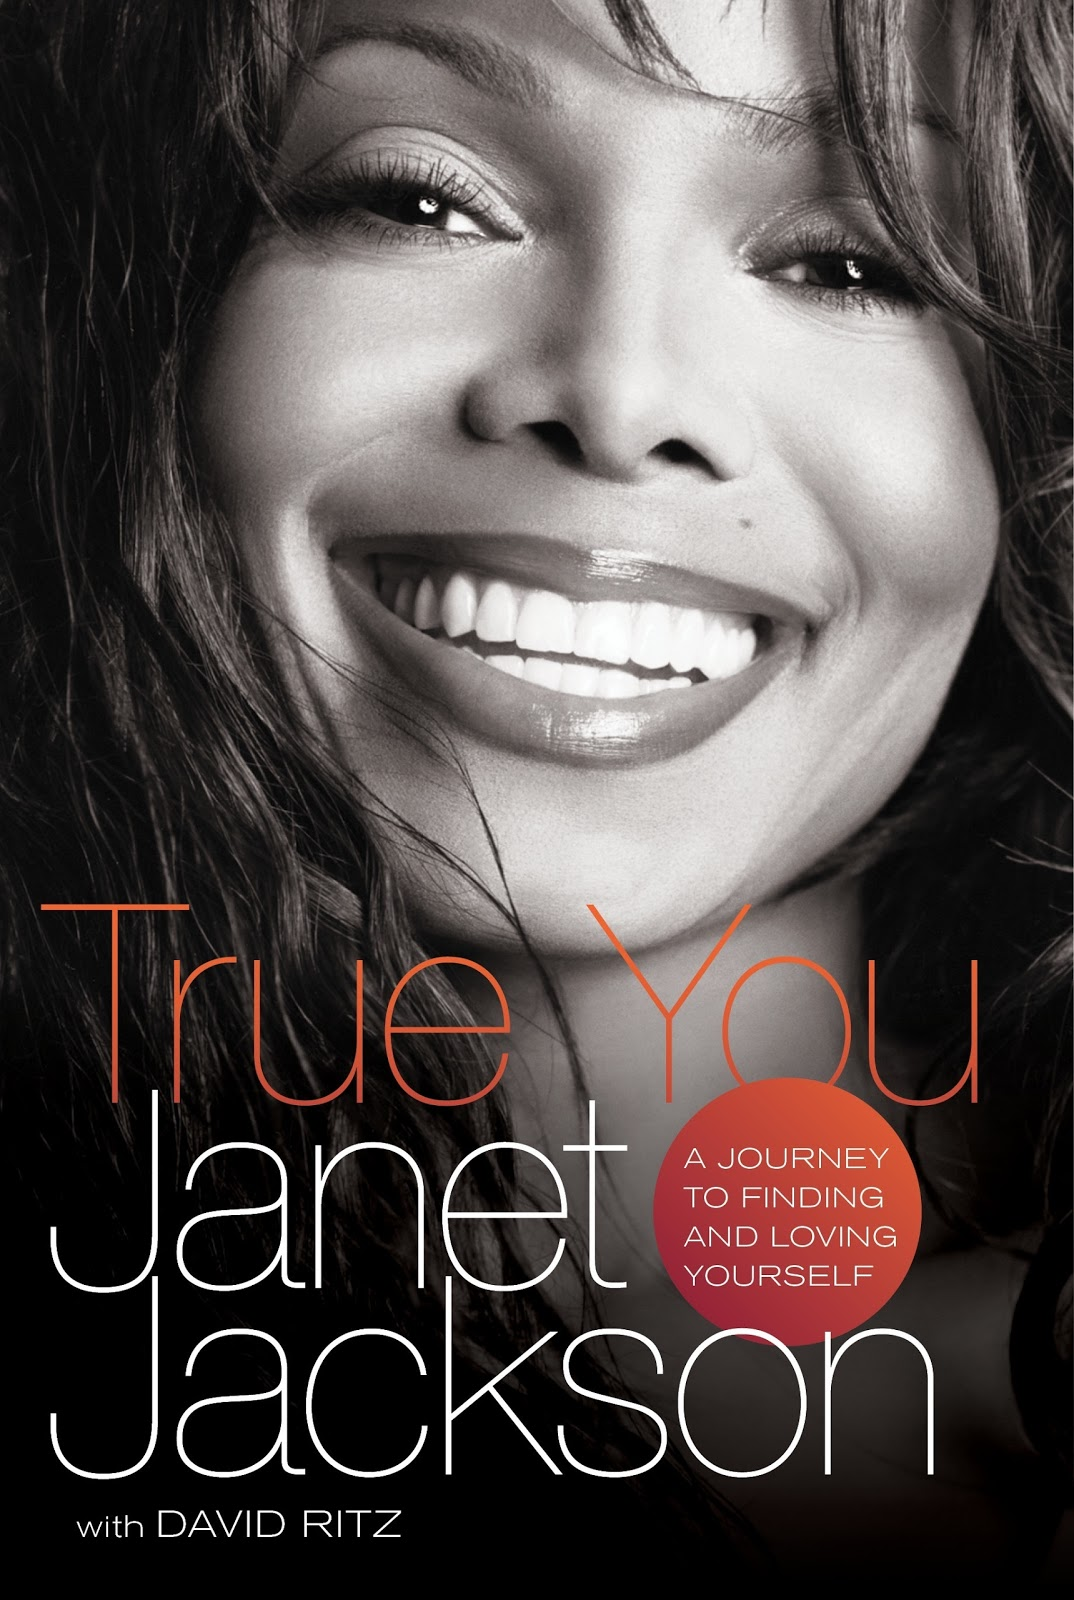 http://3.bp.blogspot.com/_FdD1Fae06Vc/TP2fIoWNF7I/AAAAAAAAARM/VC5dUo8lHsg/s1600/Janet+Jackson+True+You+Cover.jpg